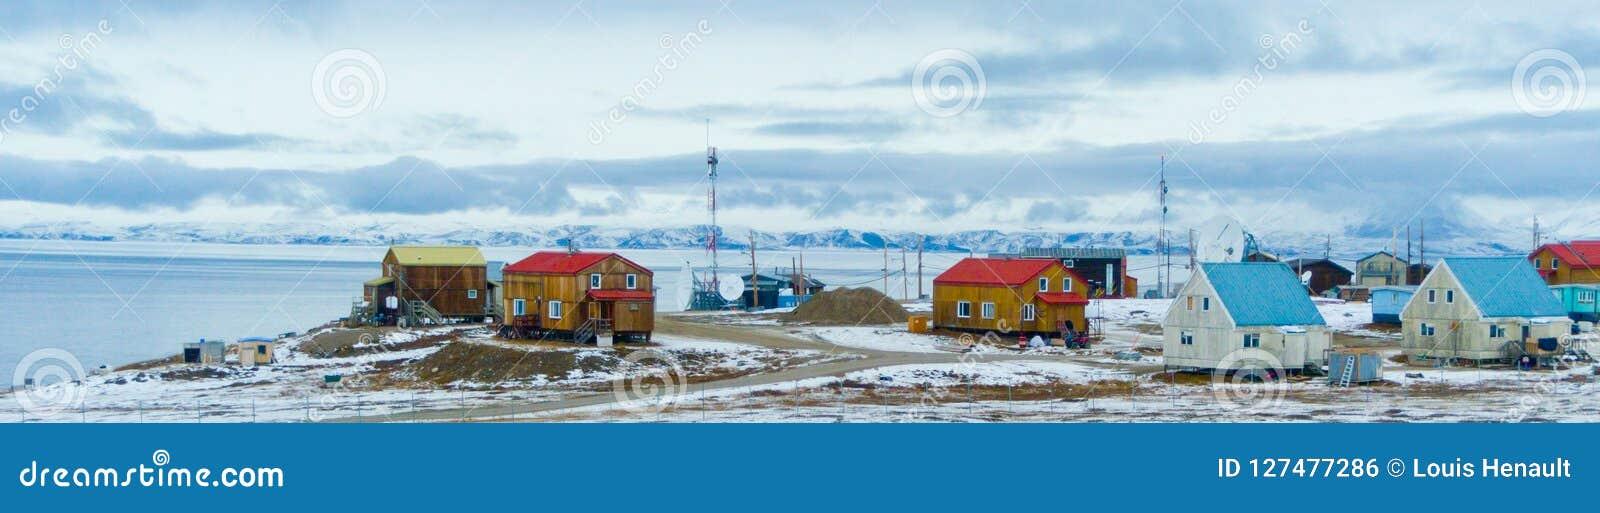 Entrada da lagoa, ilha de Bafim, Nunavut, Canadá